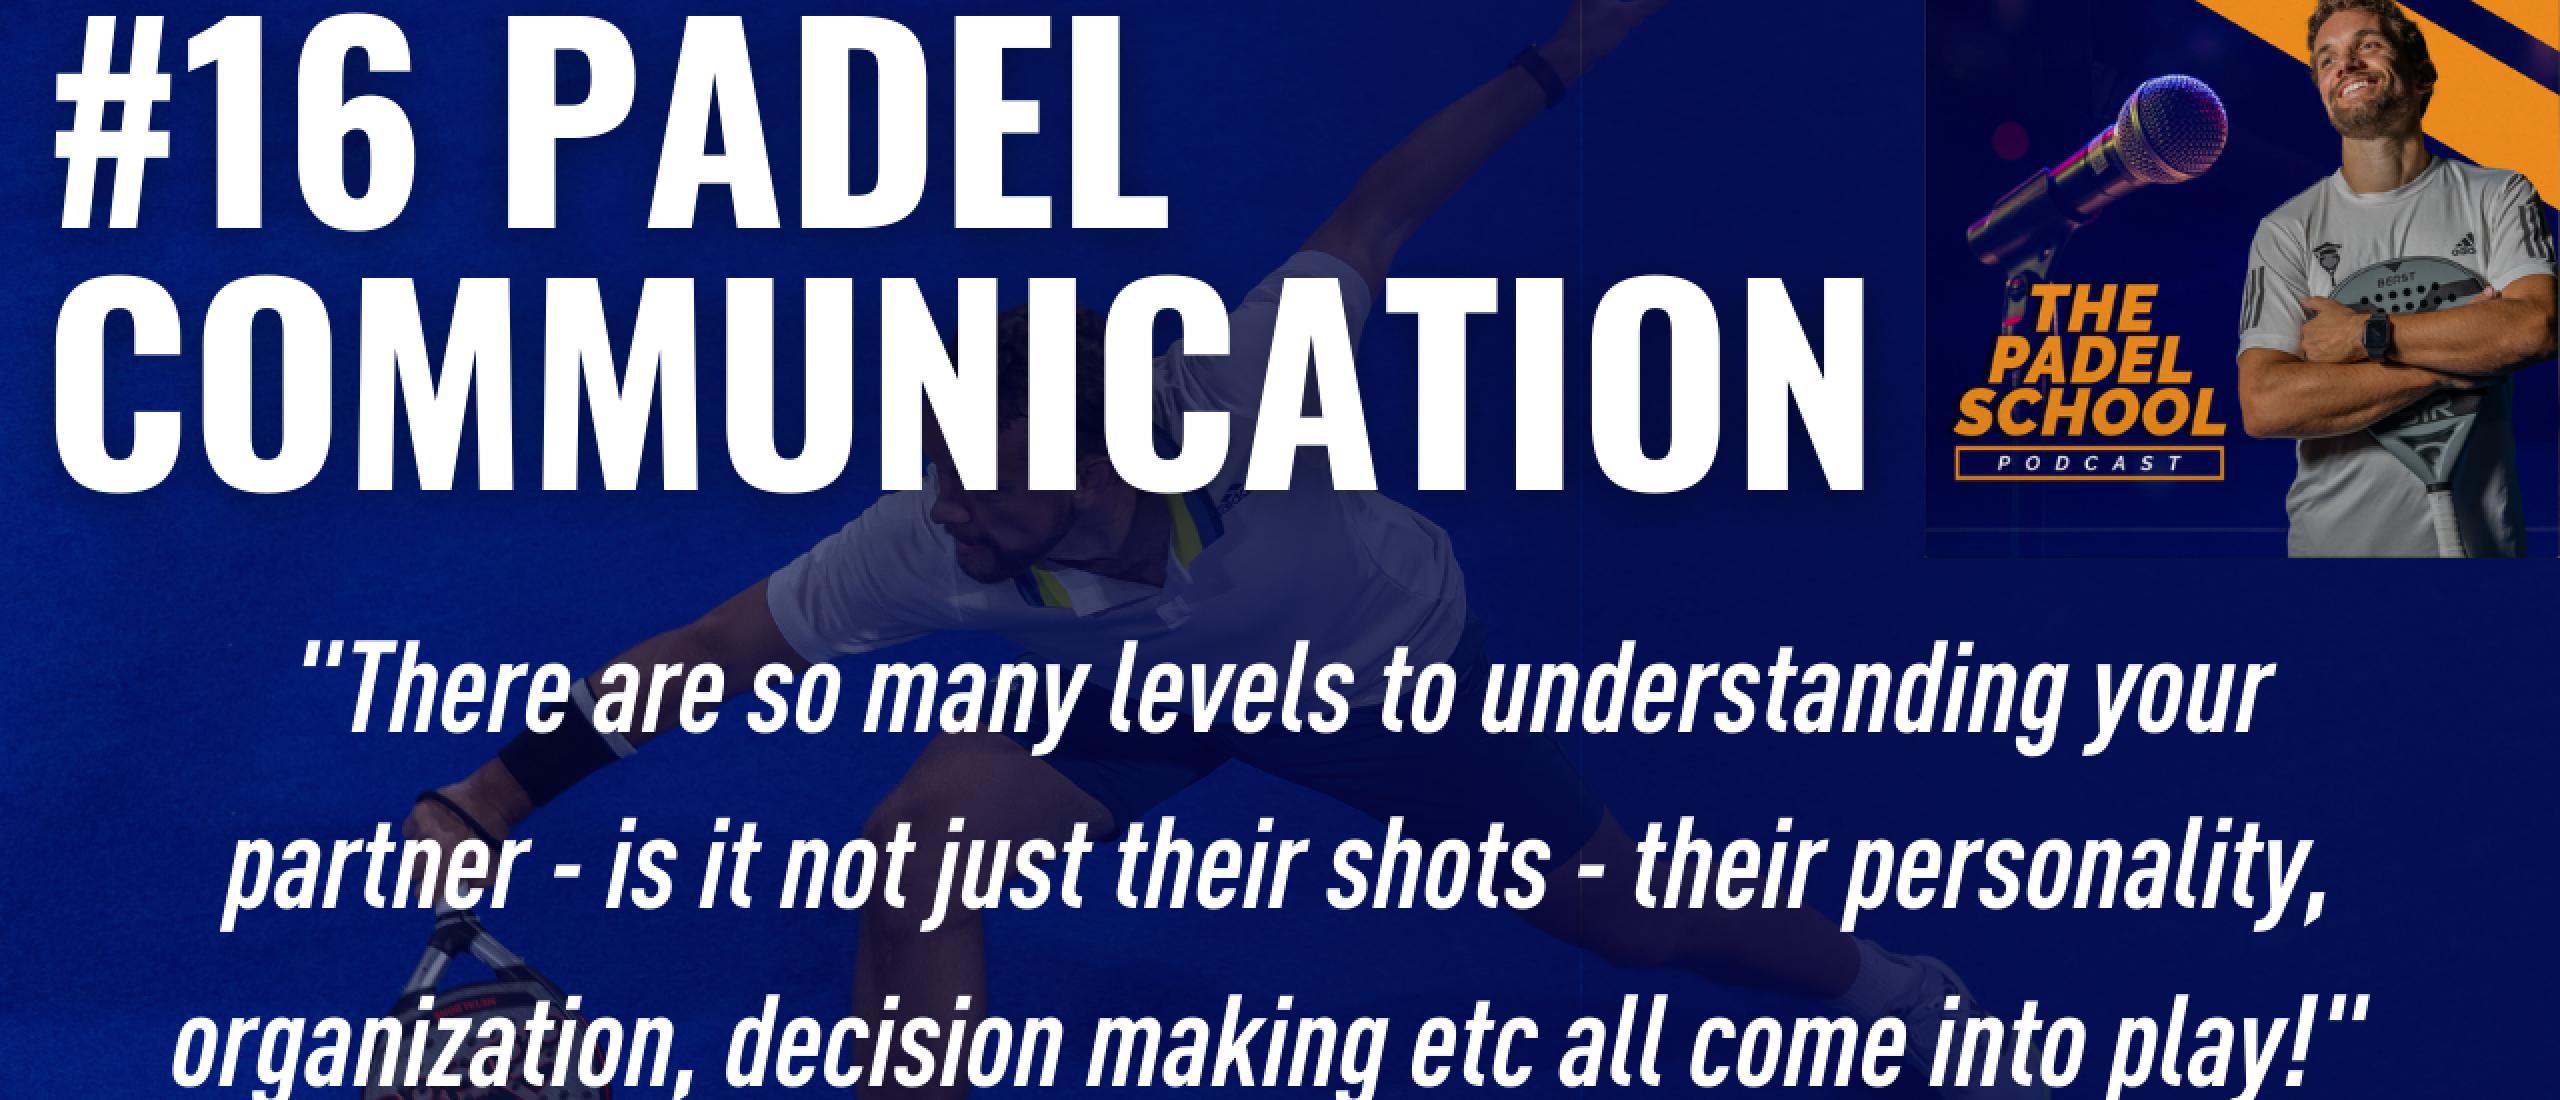 Podcast #16: Padel Communication